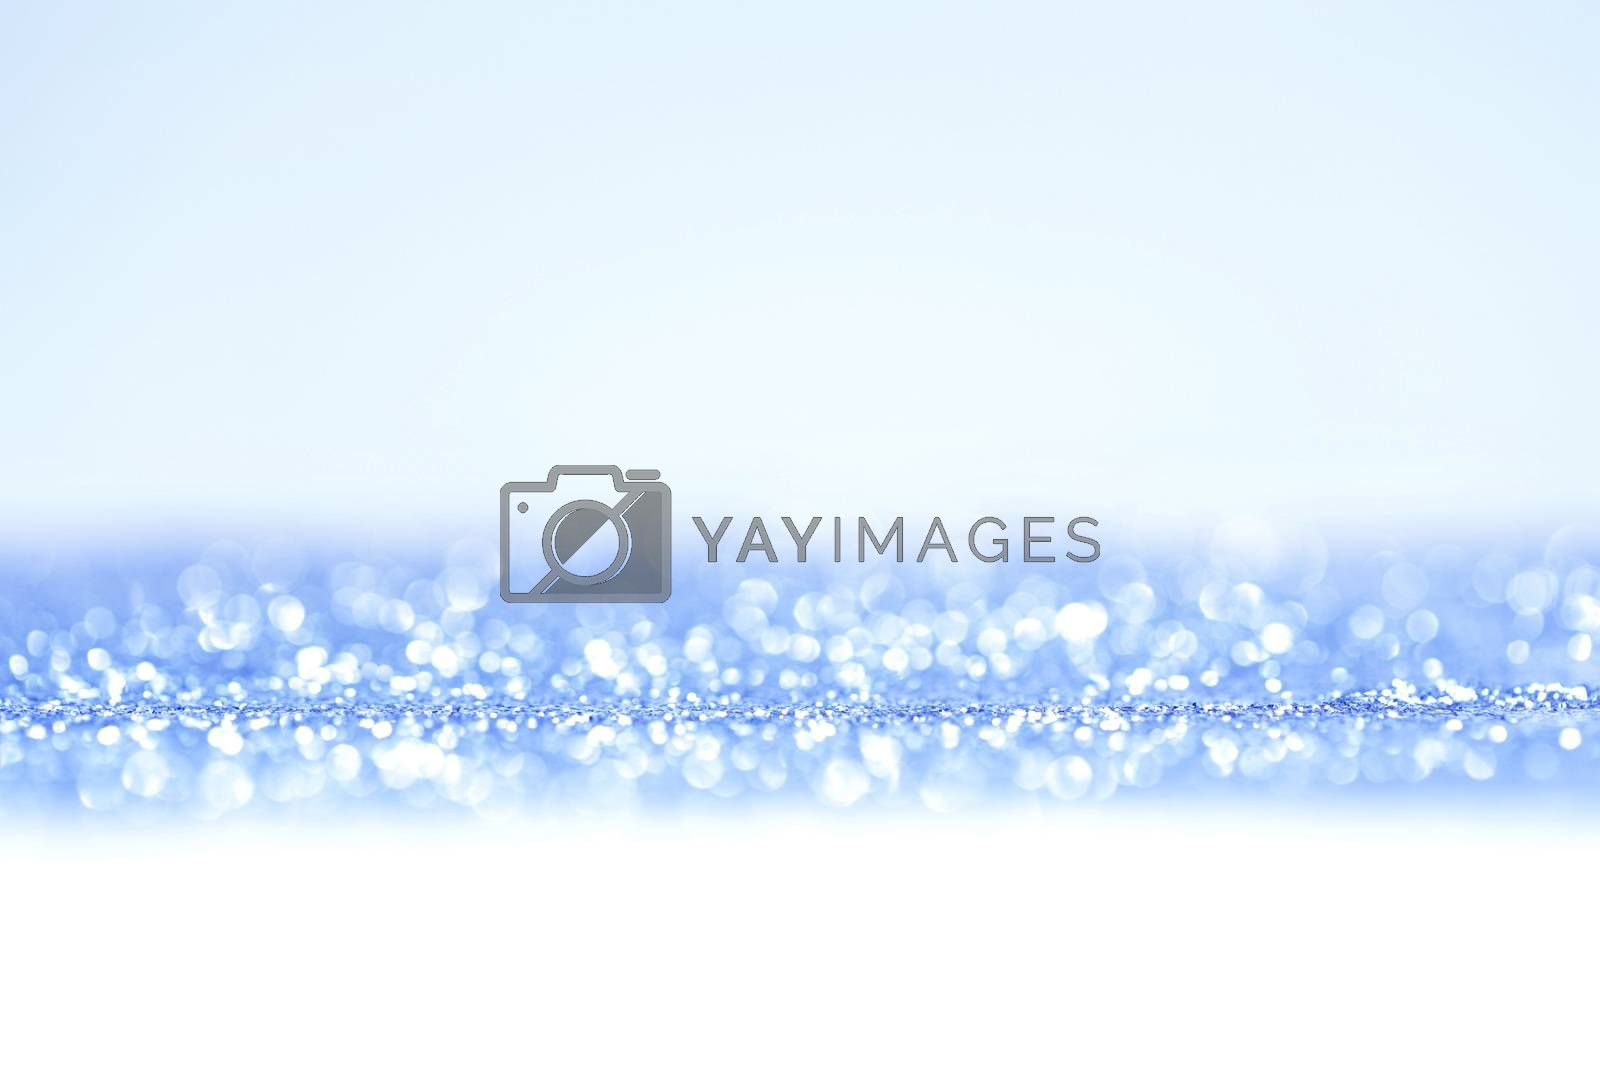 Shiny background by Yellowj